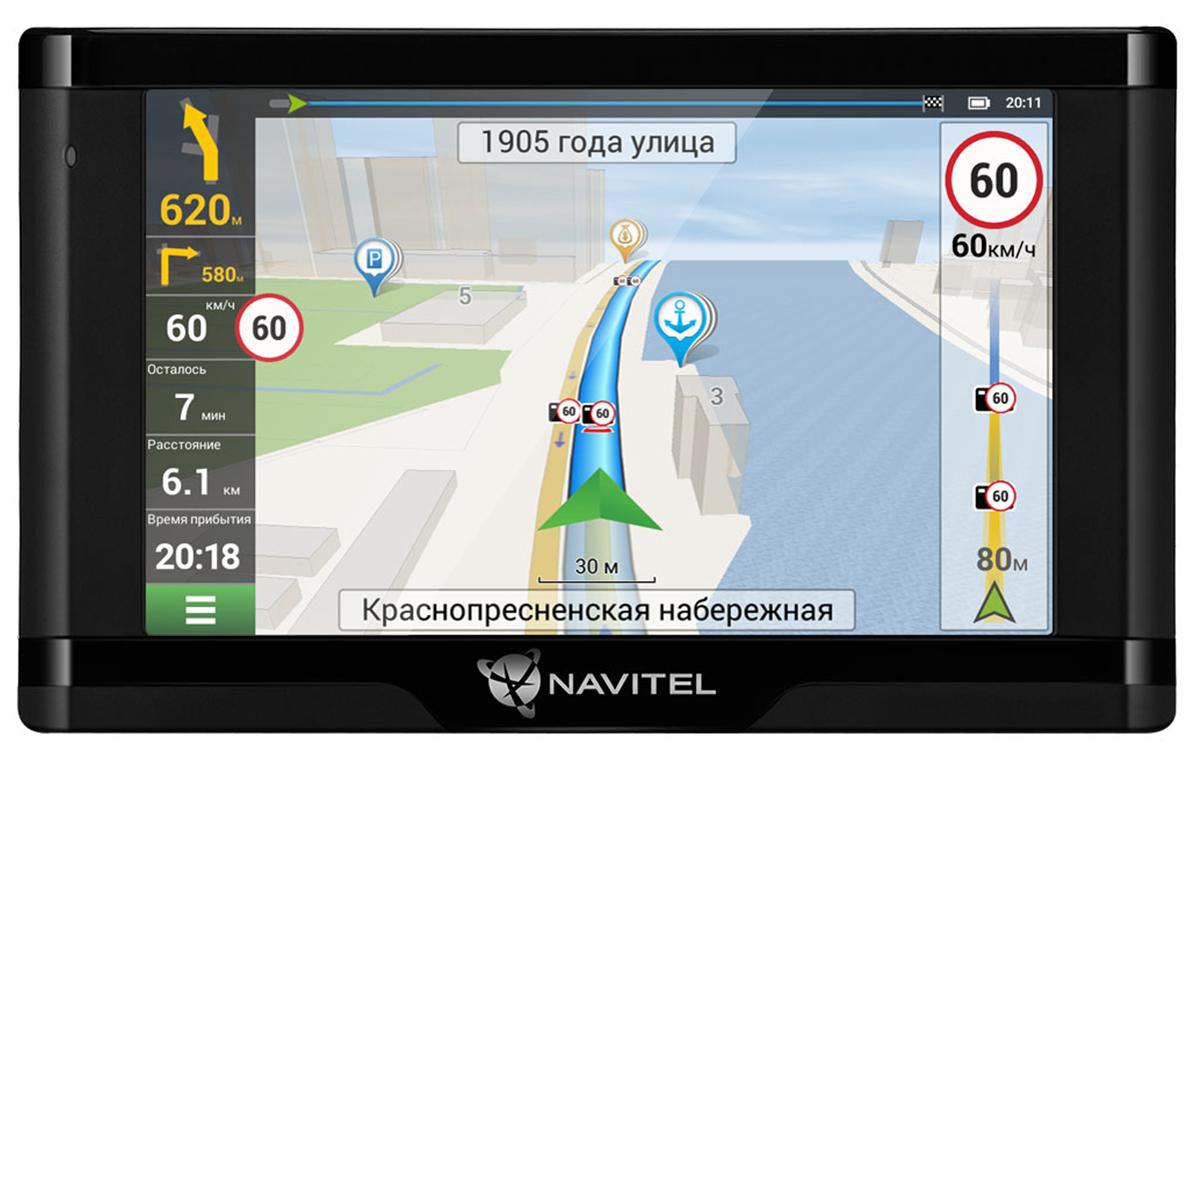 Спутниковый GPS навигатор Navitel E500 Magnetic навигатор navitel c500 navitel